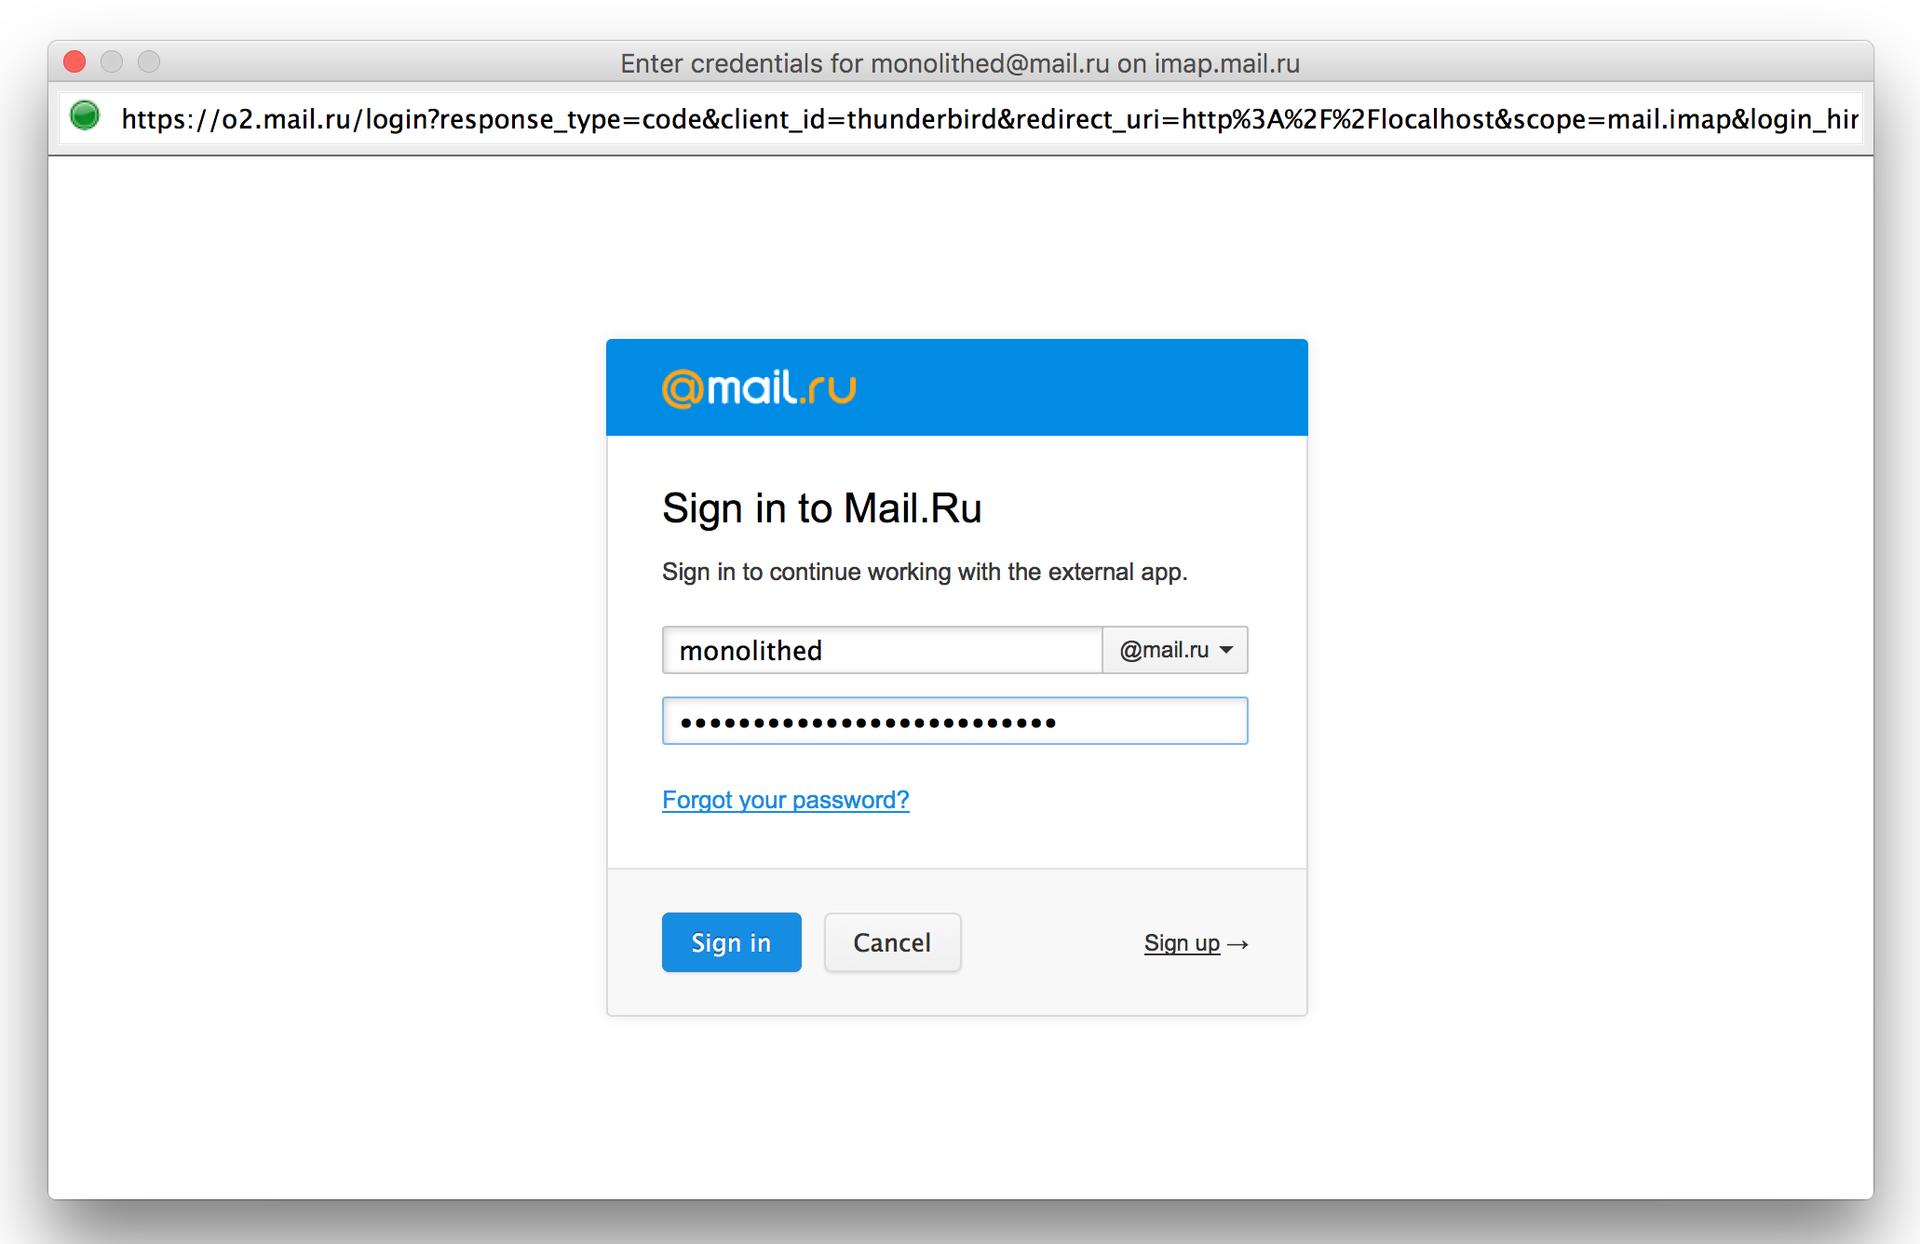 OAuth-авторизация в Mozilla Thunderbird: от зарождения до релиза - 11